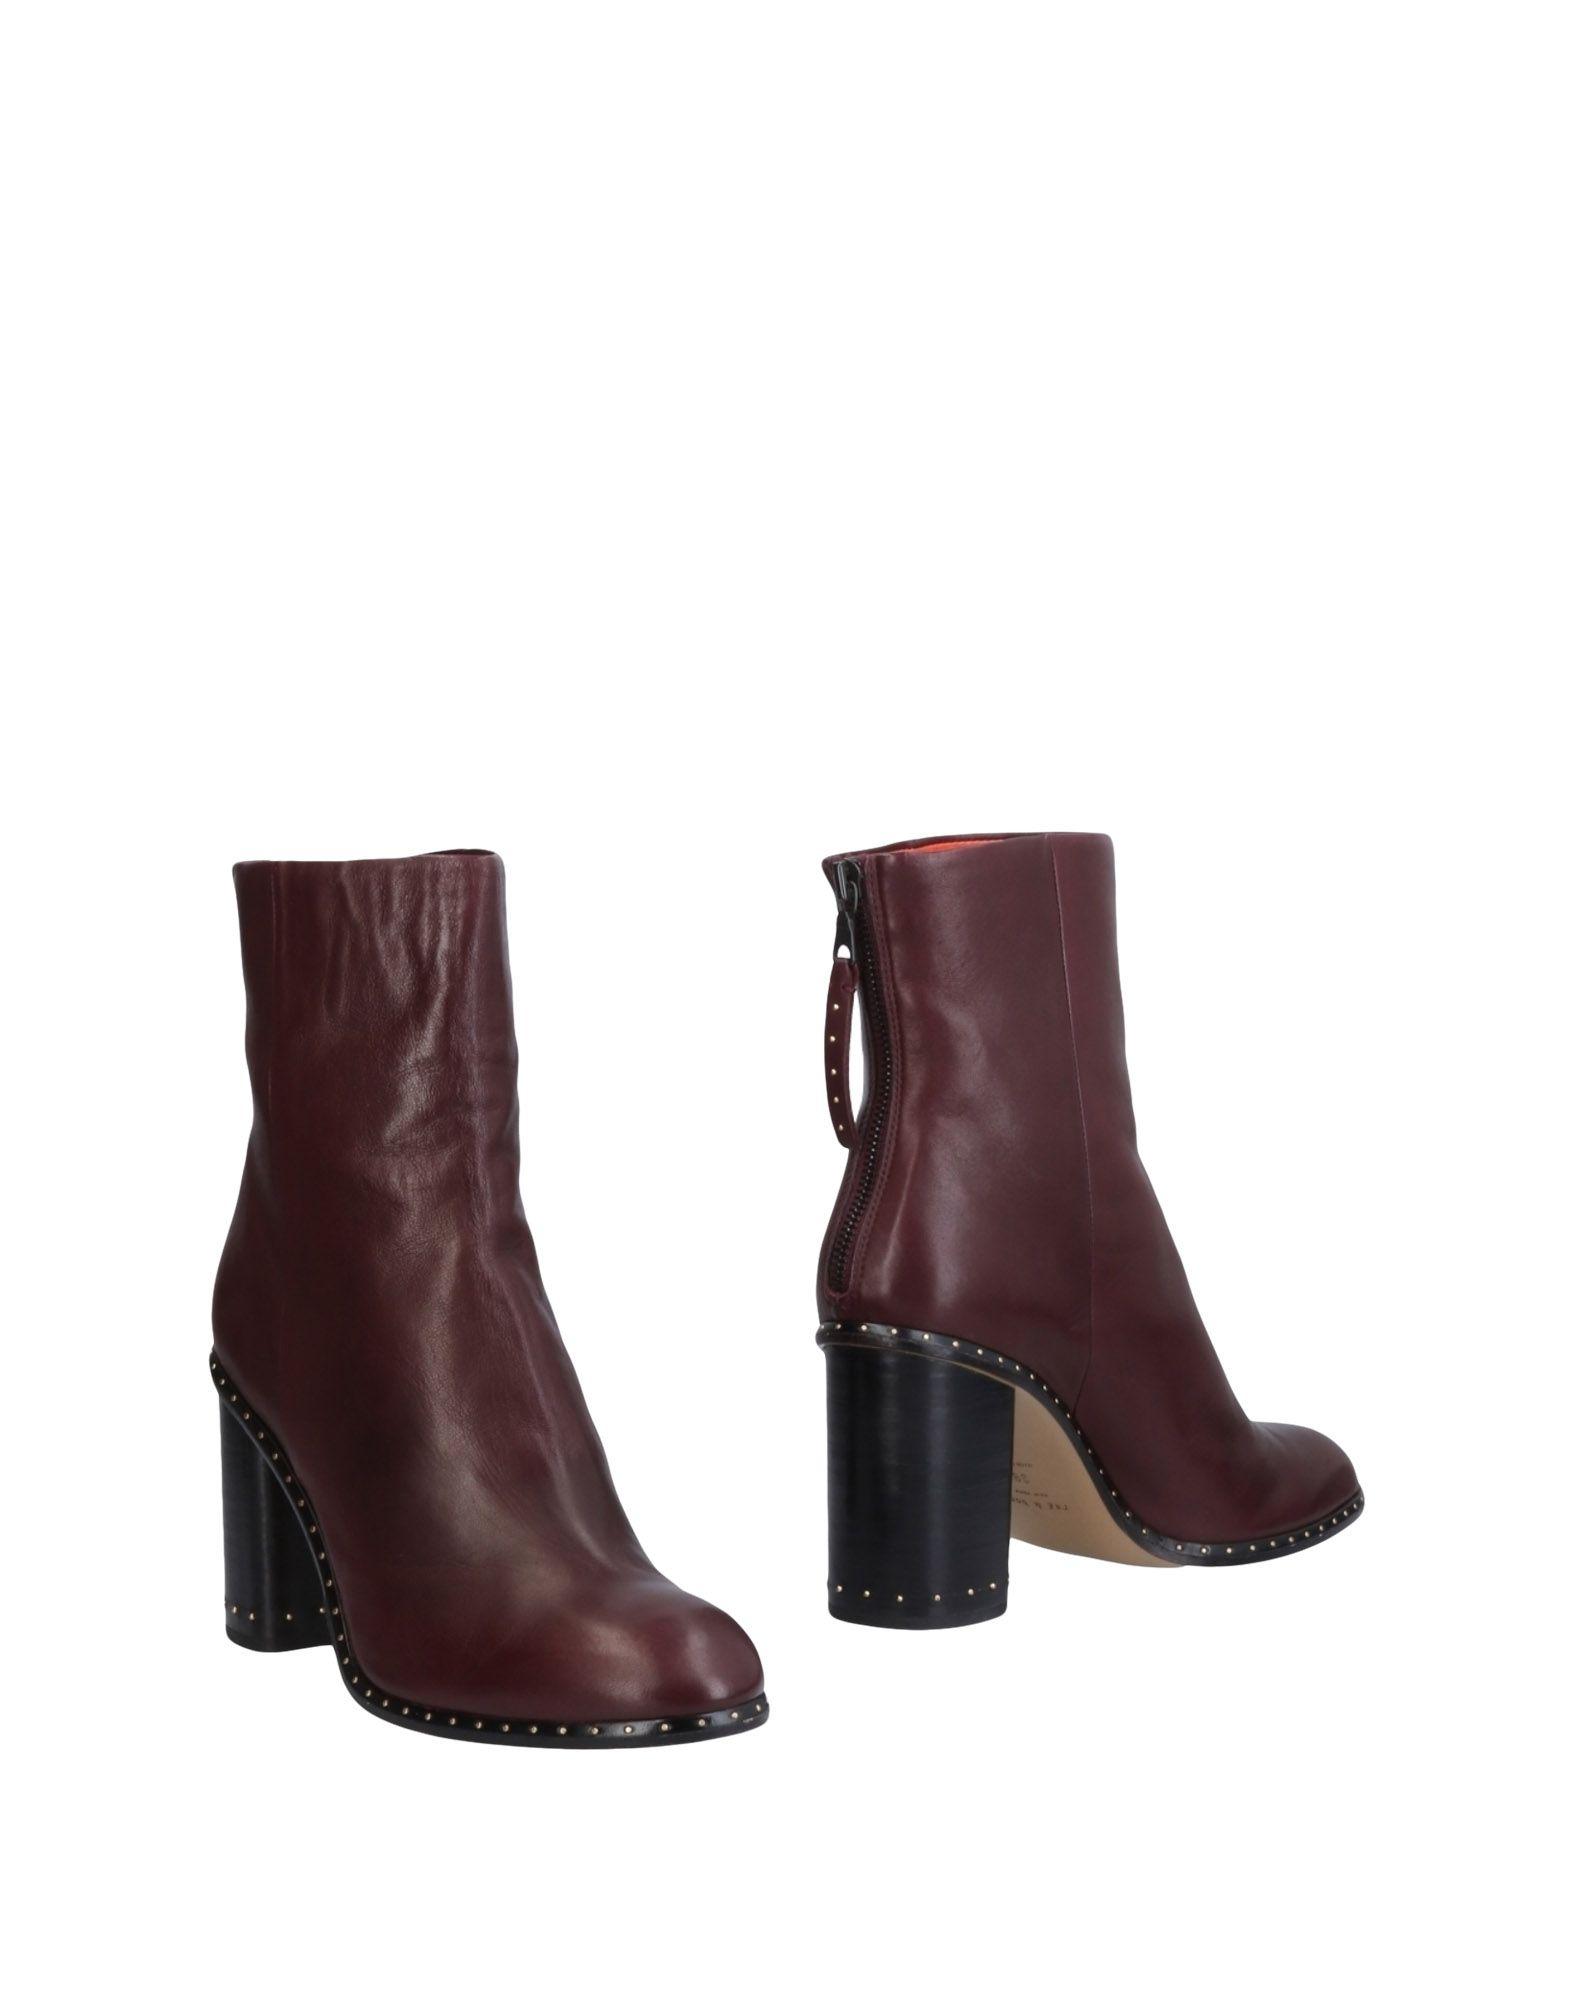 Rabatt Stiefelette Schuhe Rag & Bone Stiefelette Rabatt Damen  11454329TH e68afe